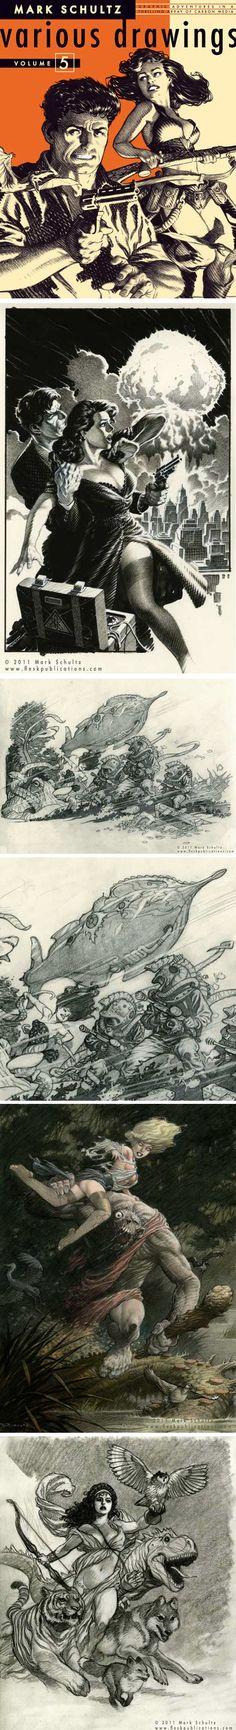 Mark Schultz: Various Drawings Volume 5